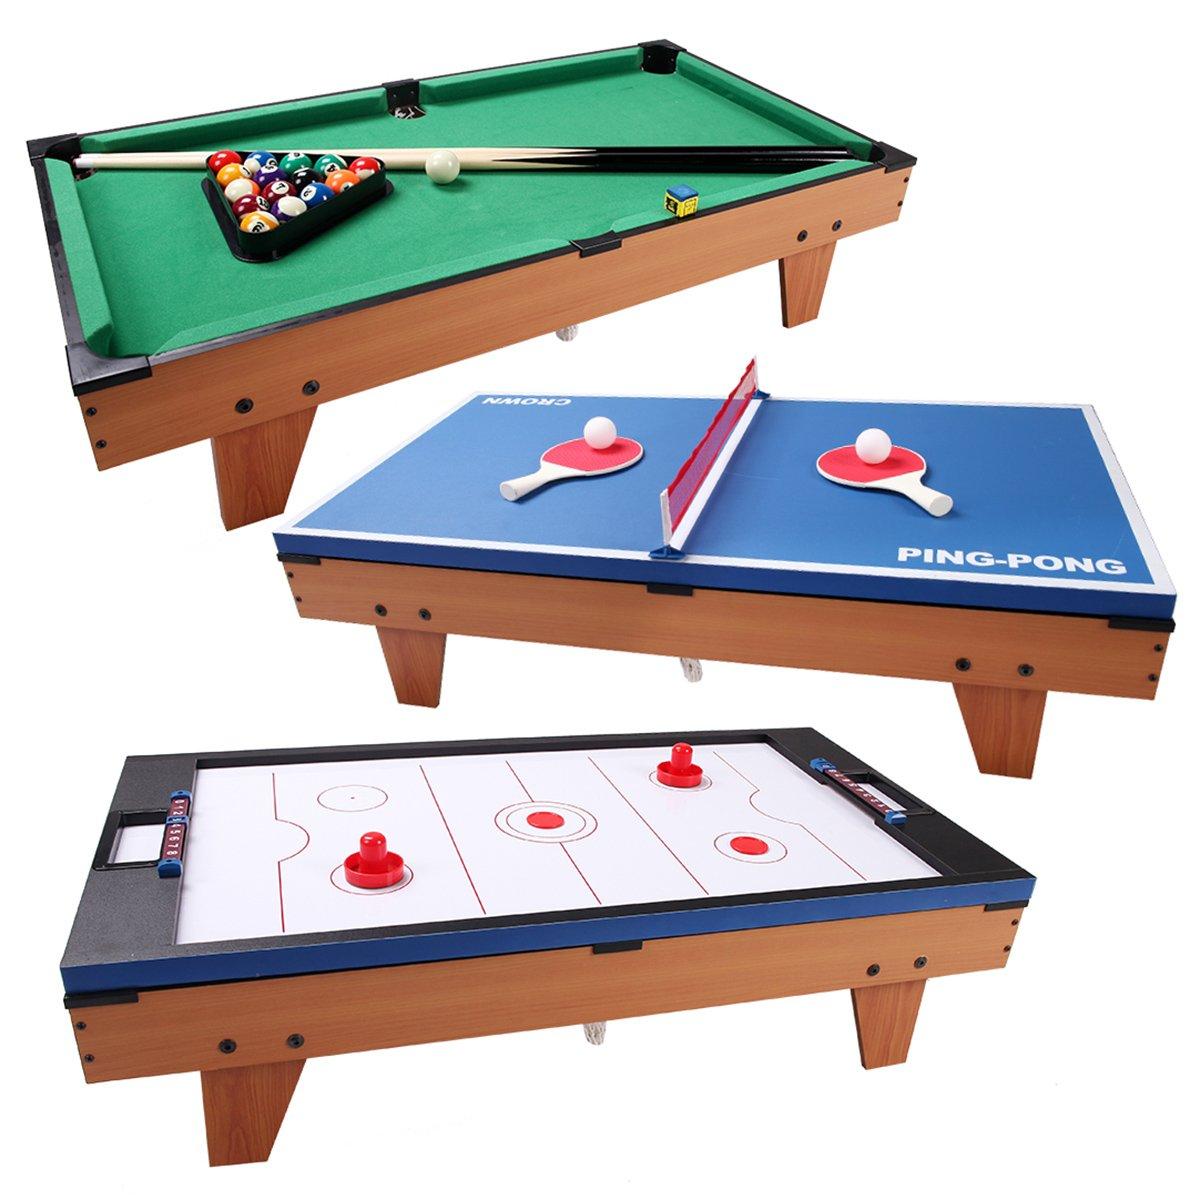 Giantex Multi Game Table Pool Hockey Foosball Table Tennis Billiard Combination Game Table (3 in 1) by Giantex